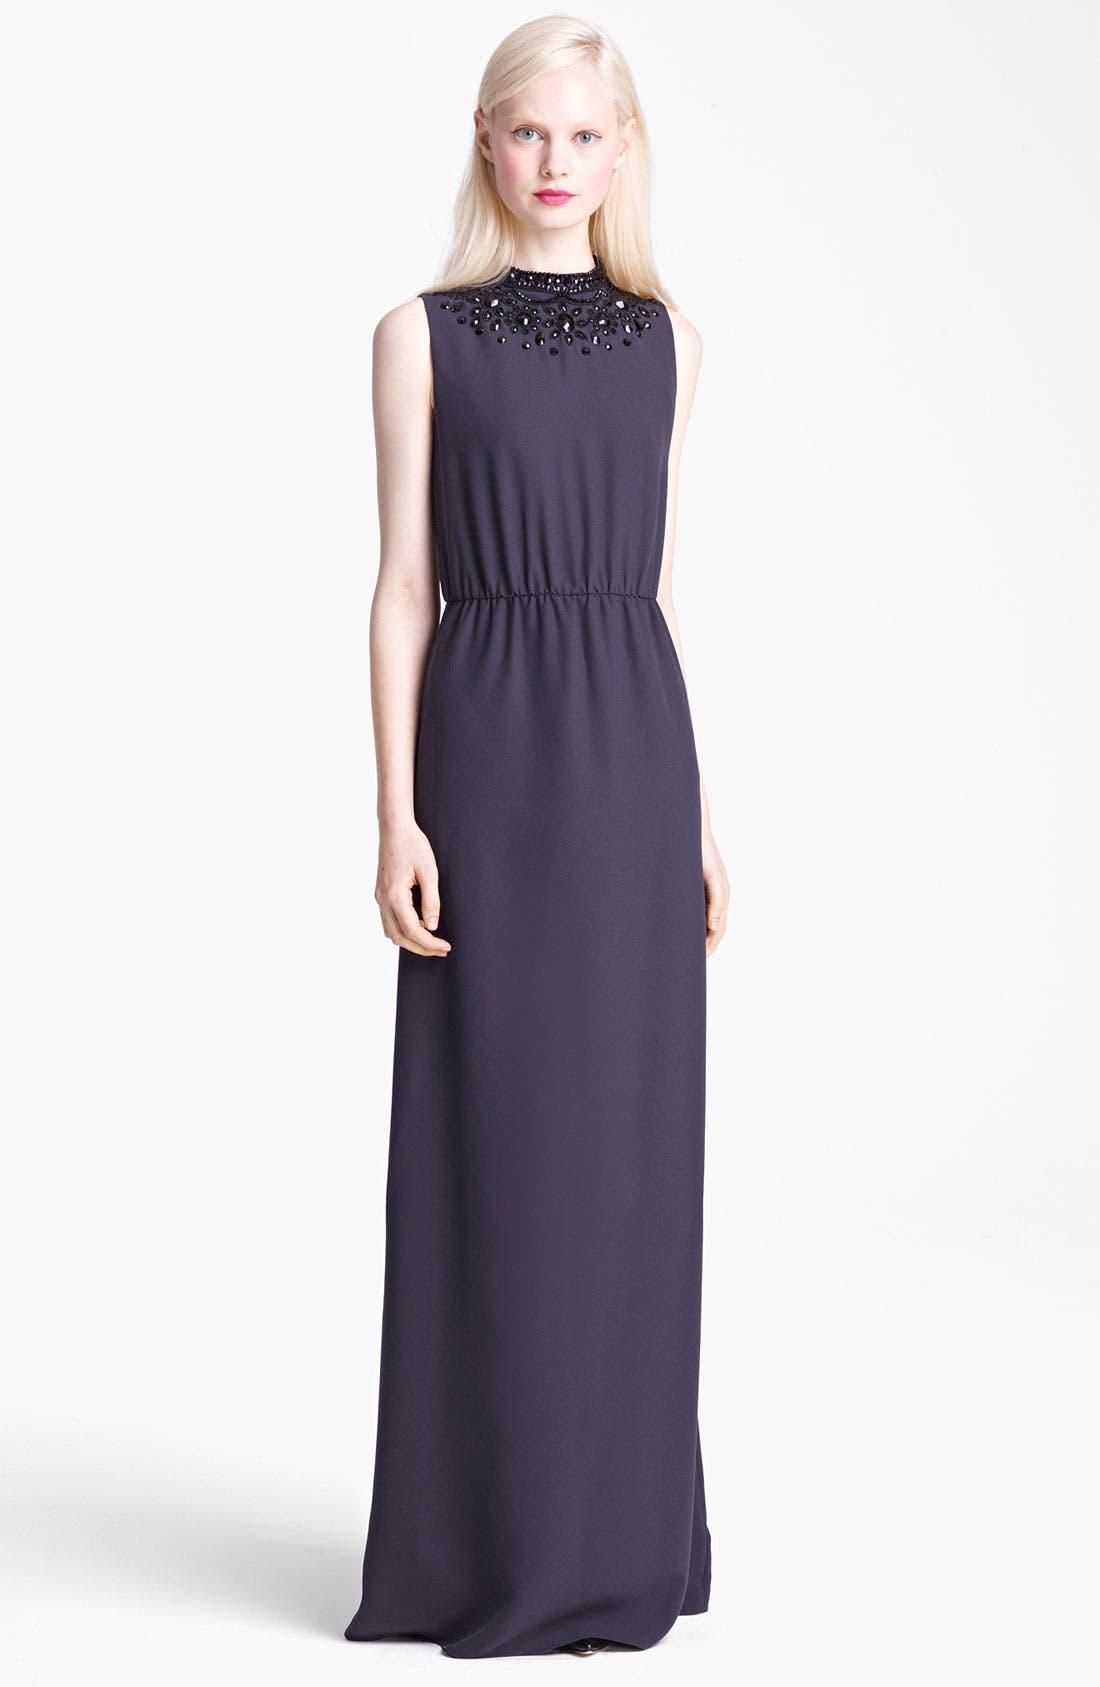 Main Image - Moschino Cheap & Chic Beaded Neckline Maxi Dress